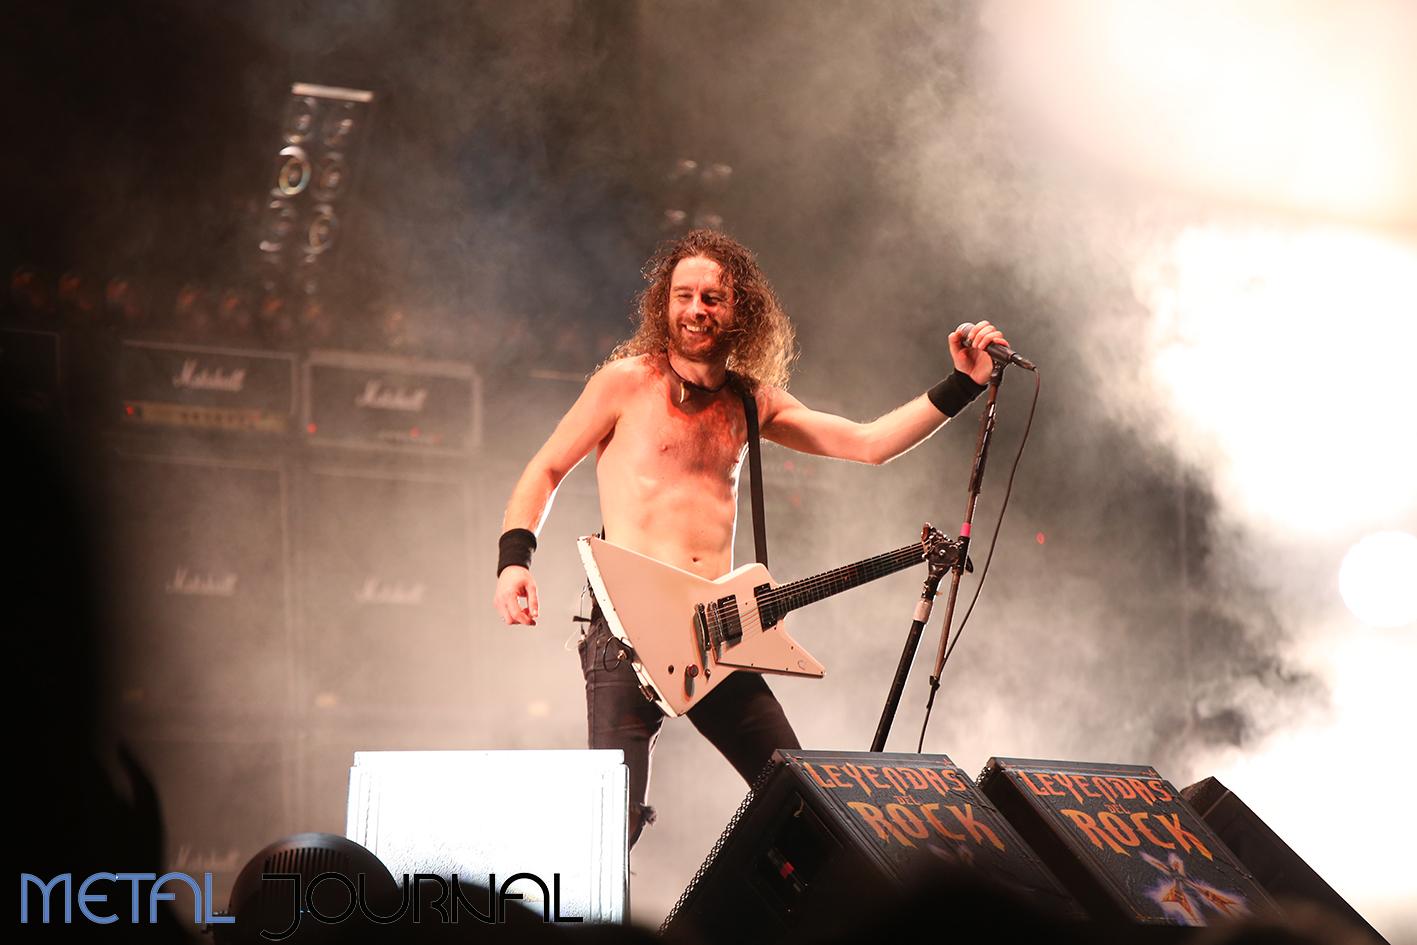 airbourne - leyendas del rock 2019 metal journal pic 5